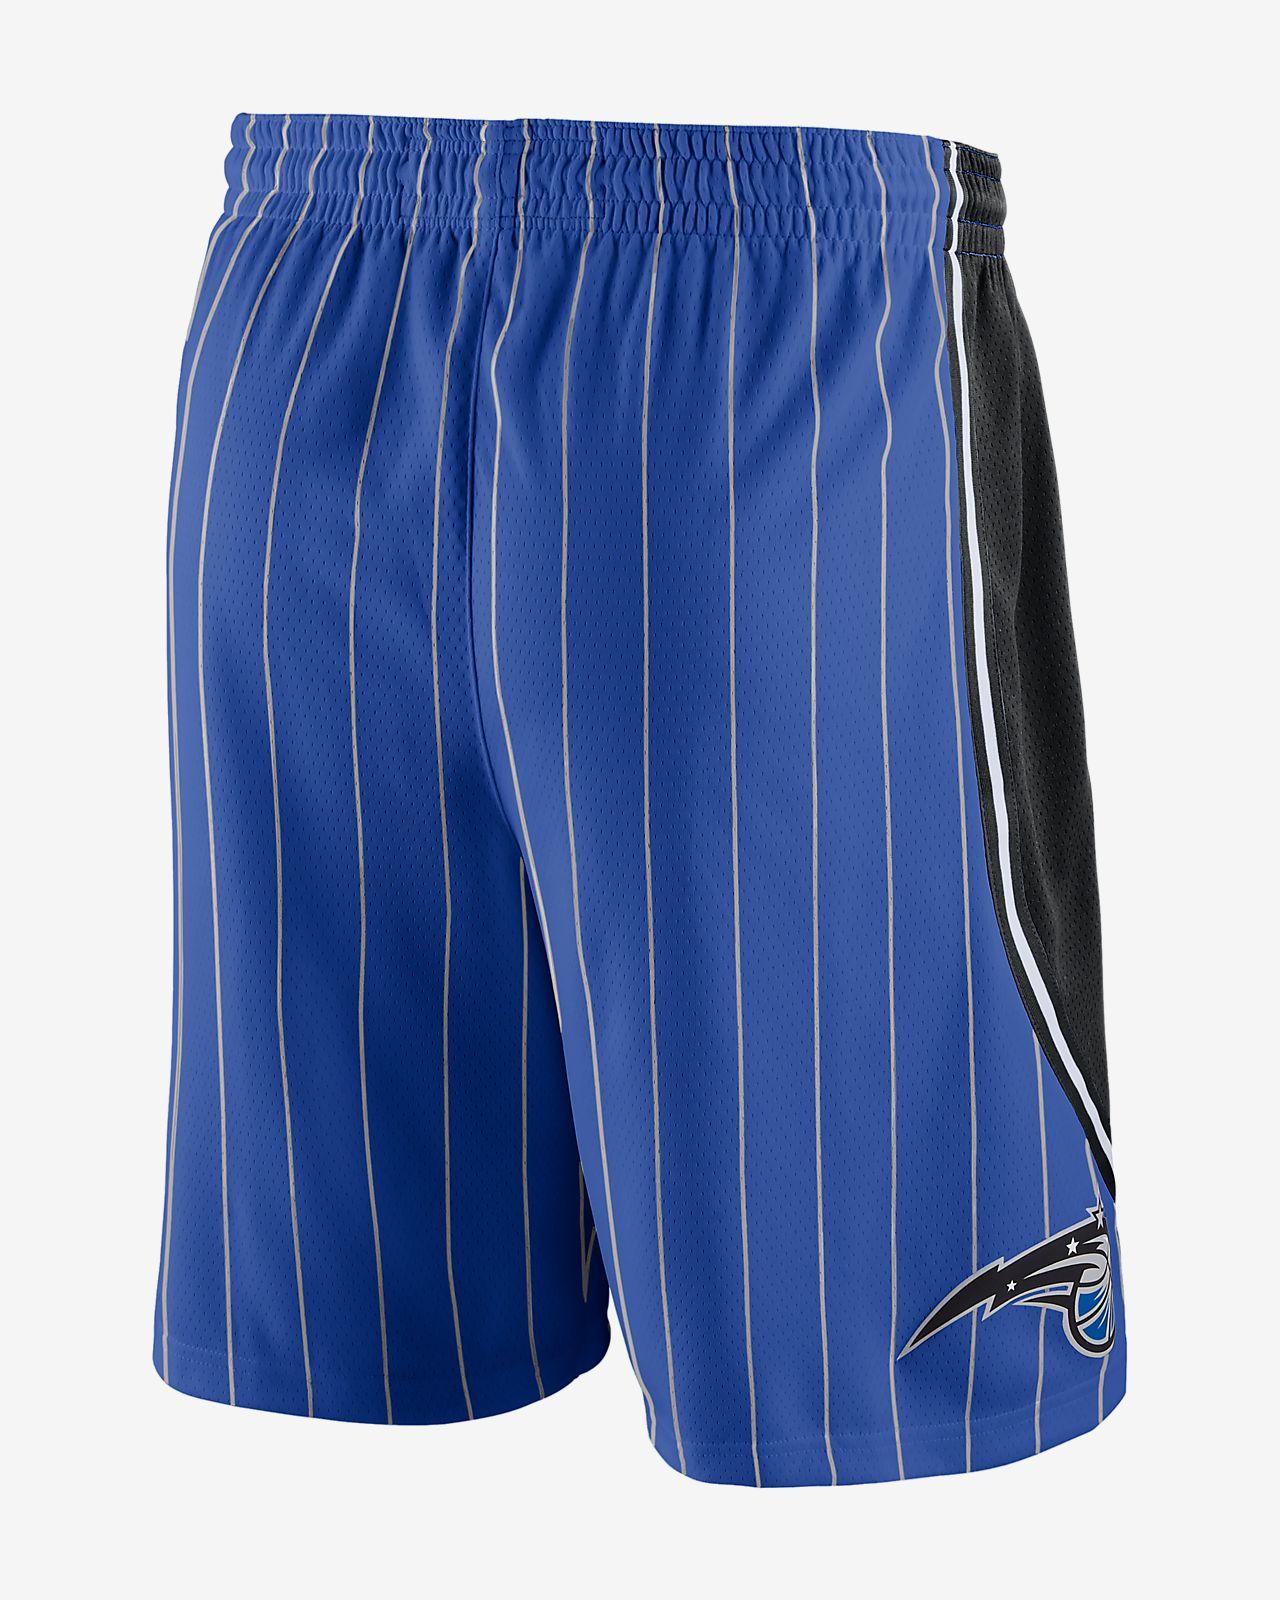 29fc43b287e Orlando Magic Icon Edition Swingman Men s Nike NBA Shorts. Nike.com IE